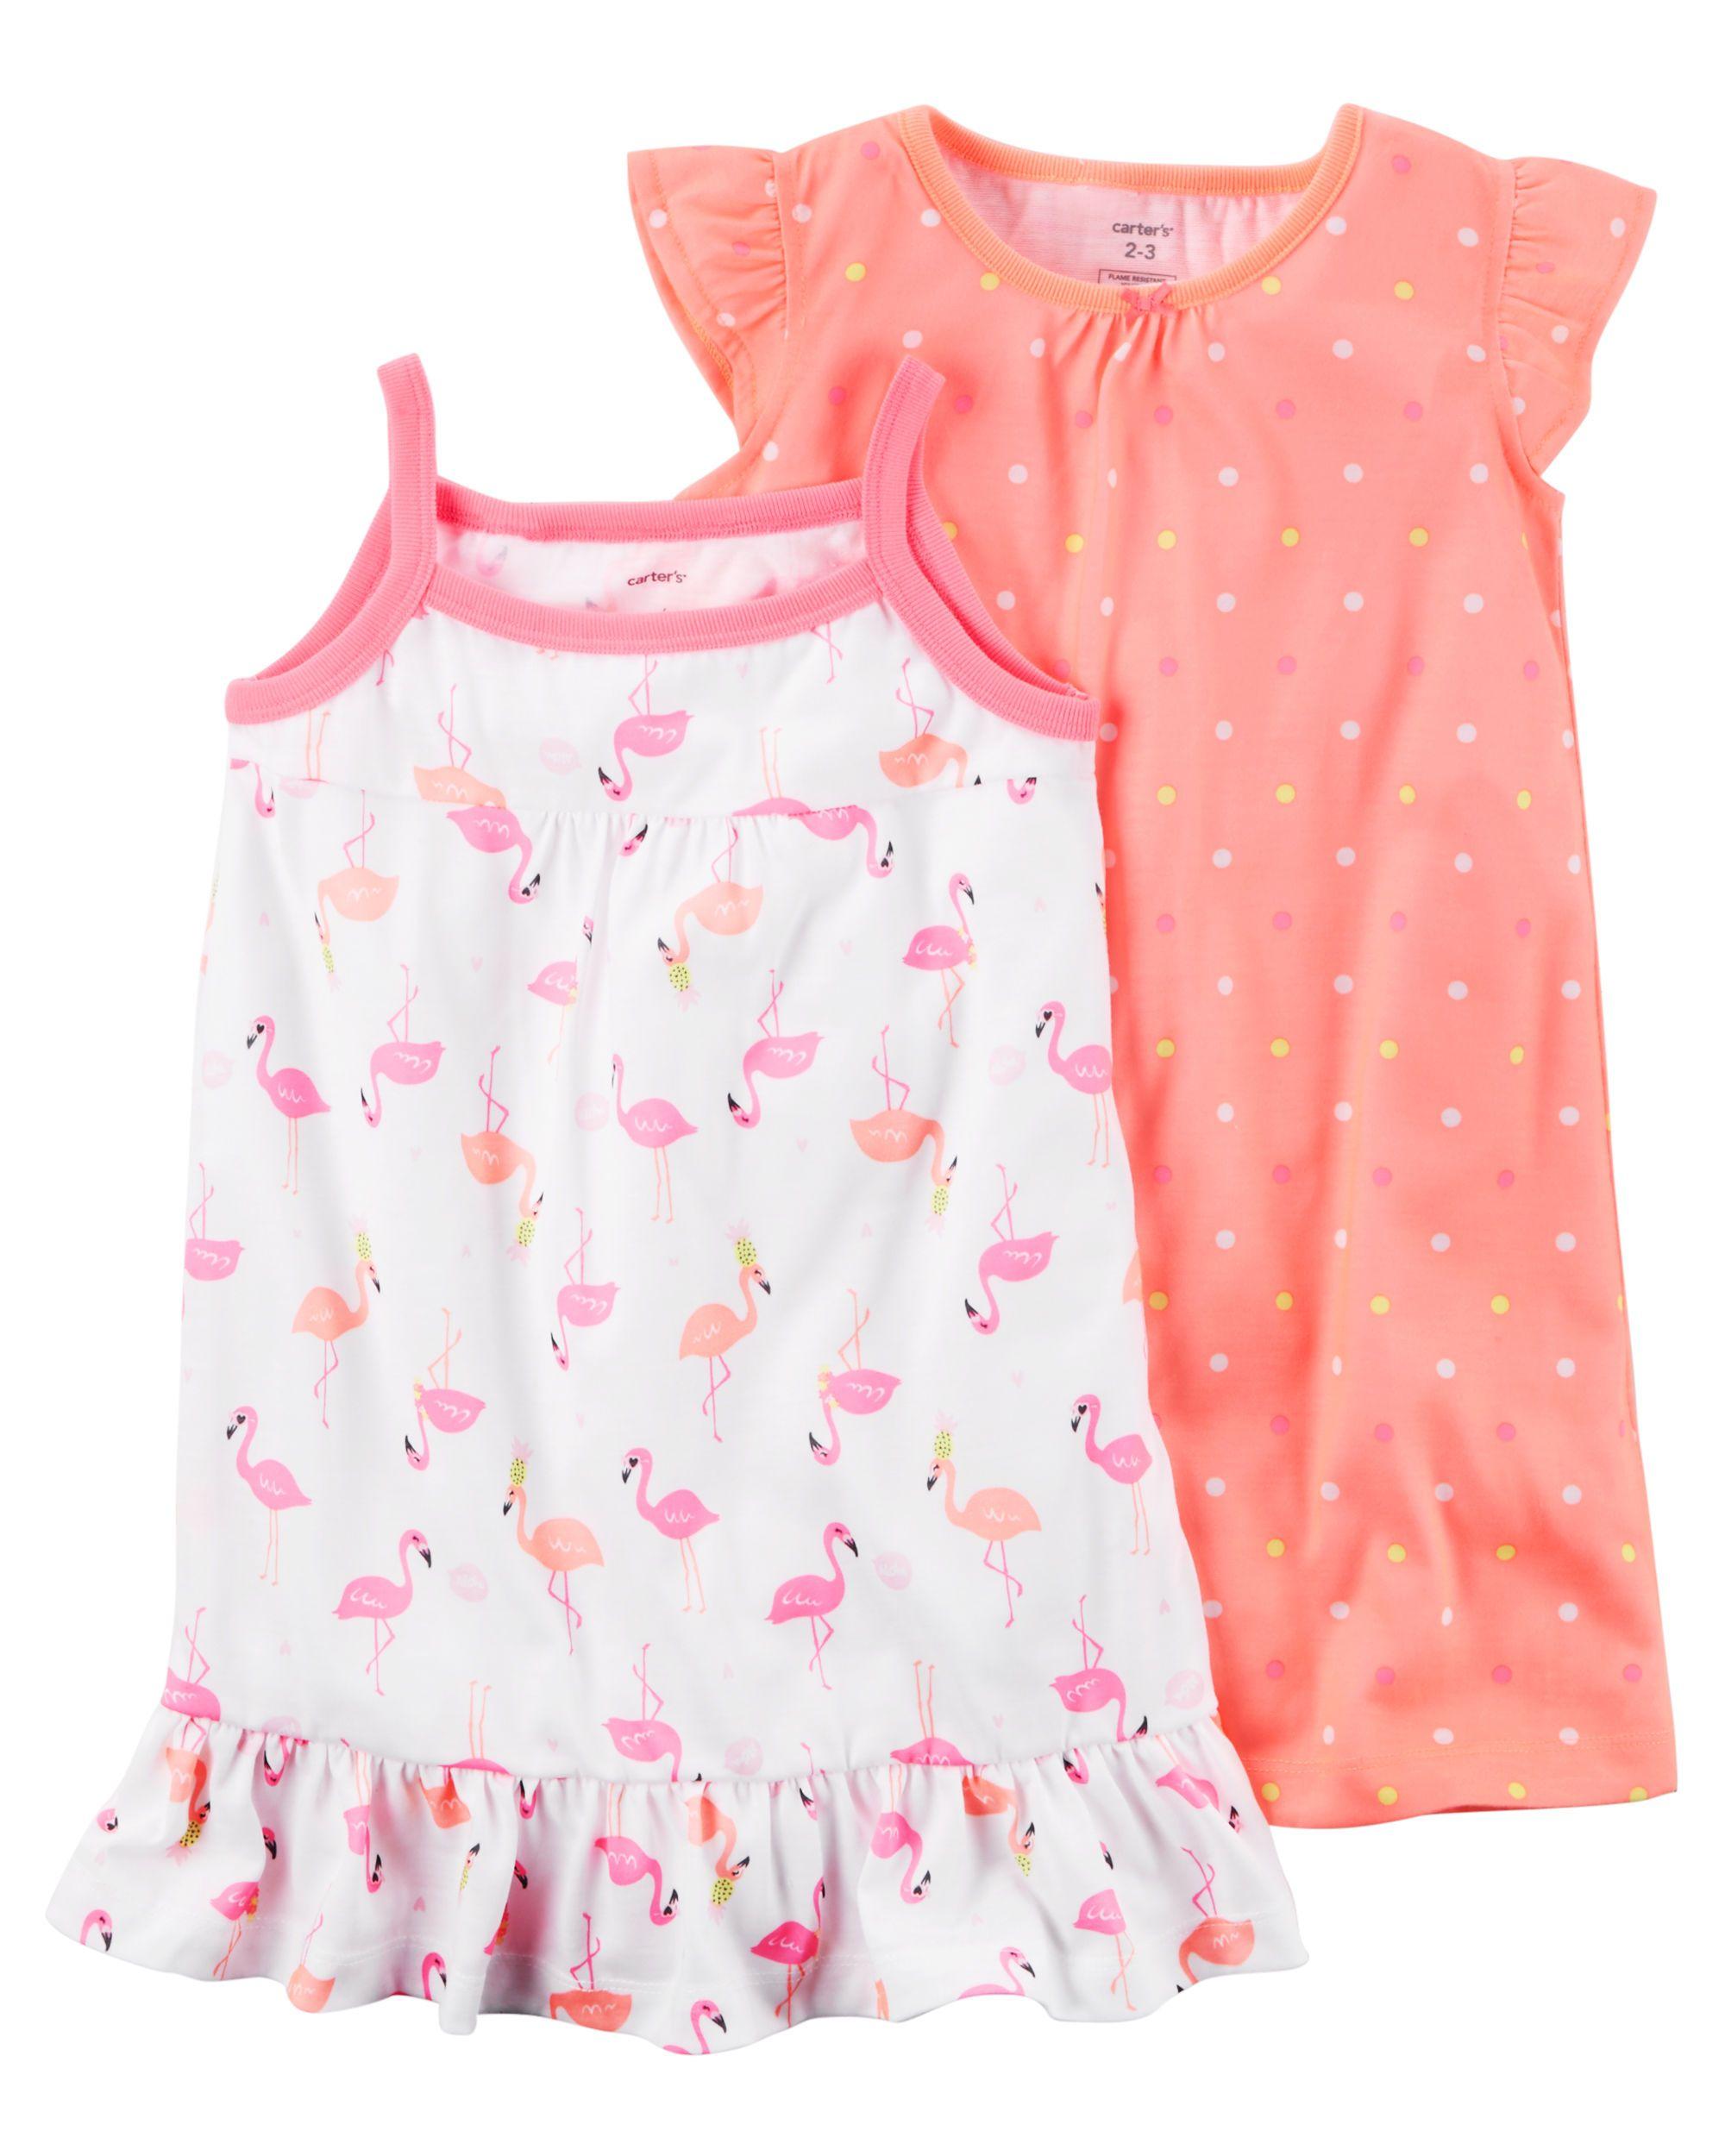 06484470e Toddler Girl 2-Pack Neon Sleep Gowns